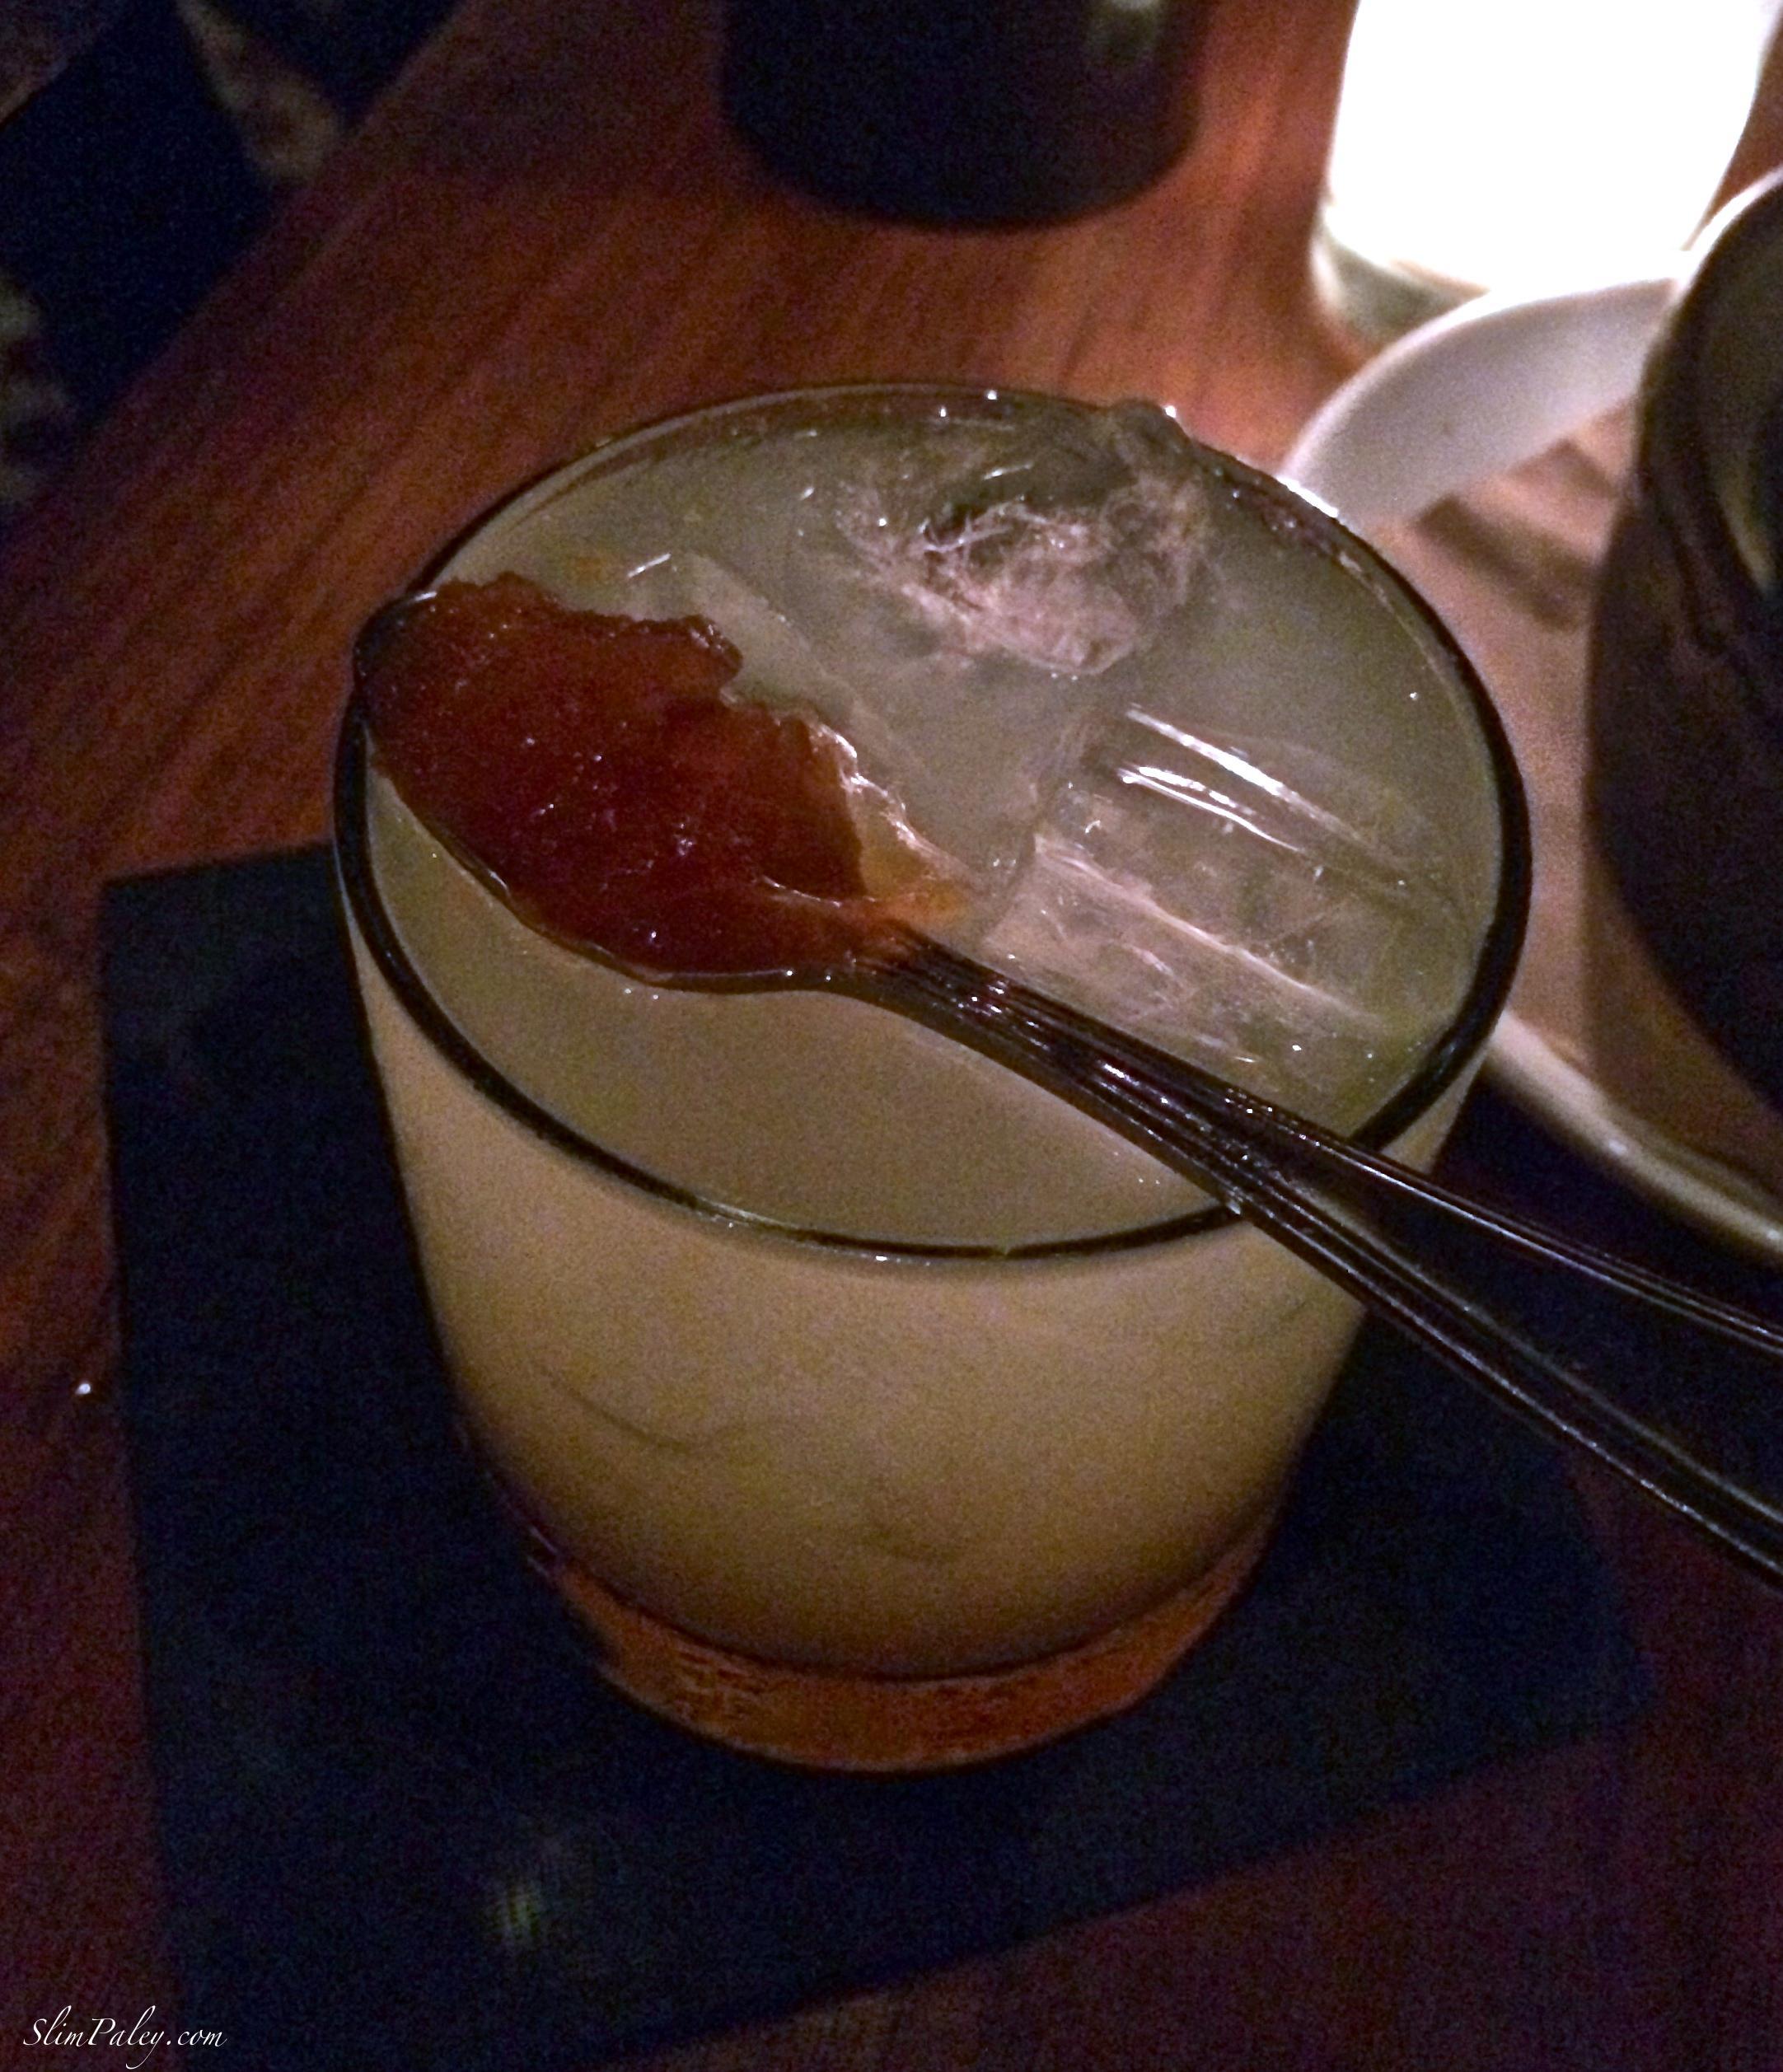 gin & jam slimpaley